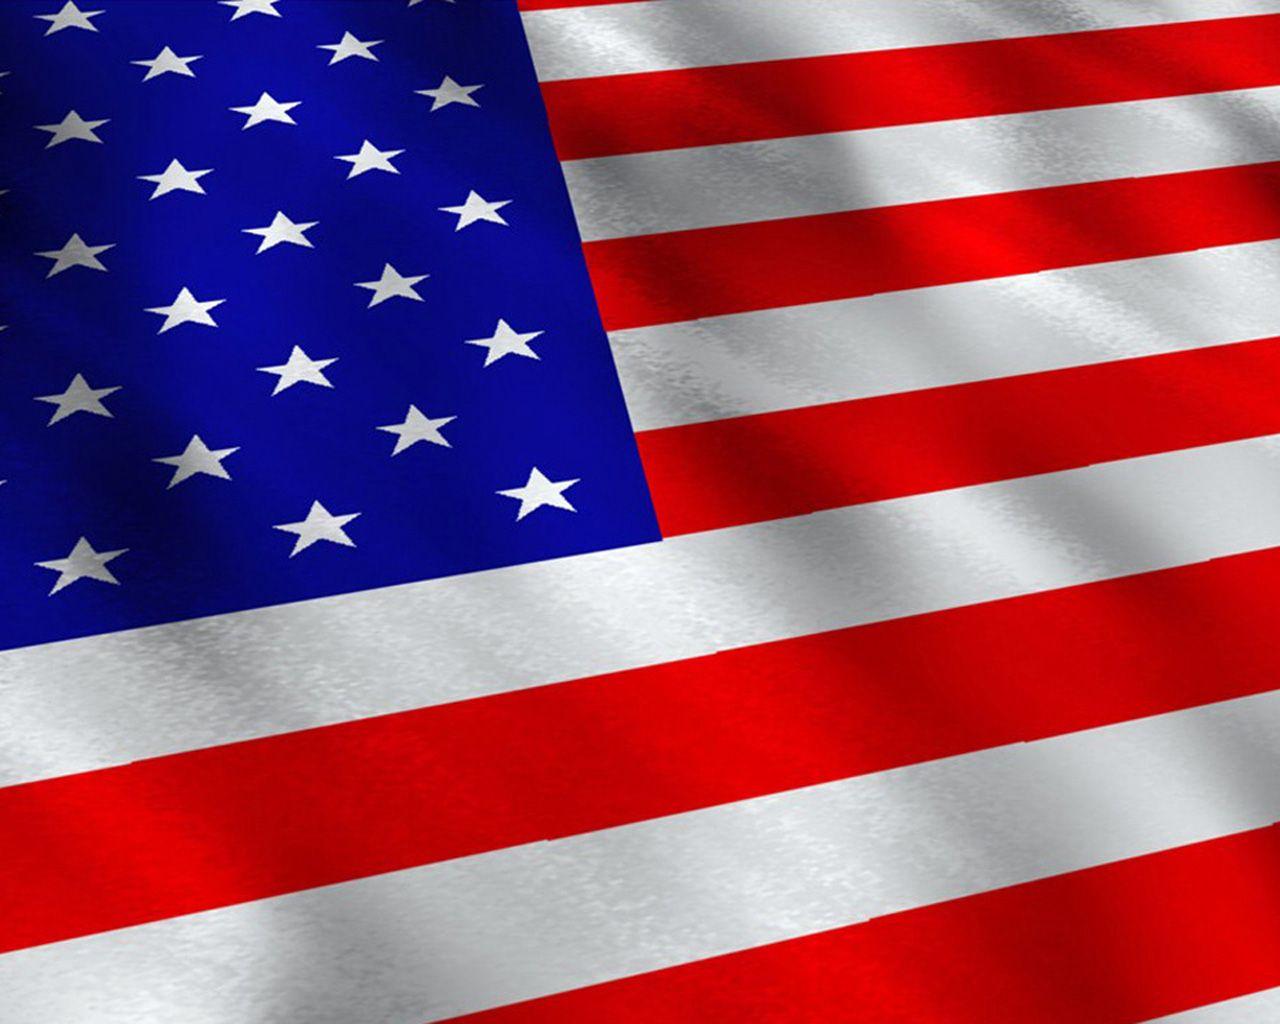 comdesktop wallpaper for mac american flag wallpaper background 1280x1024